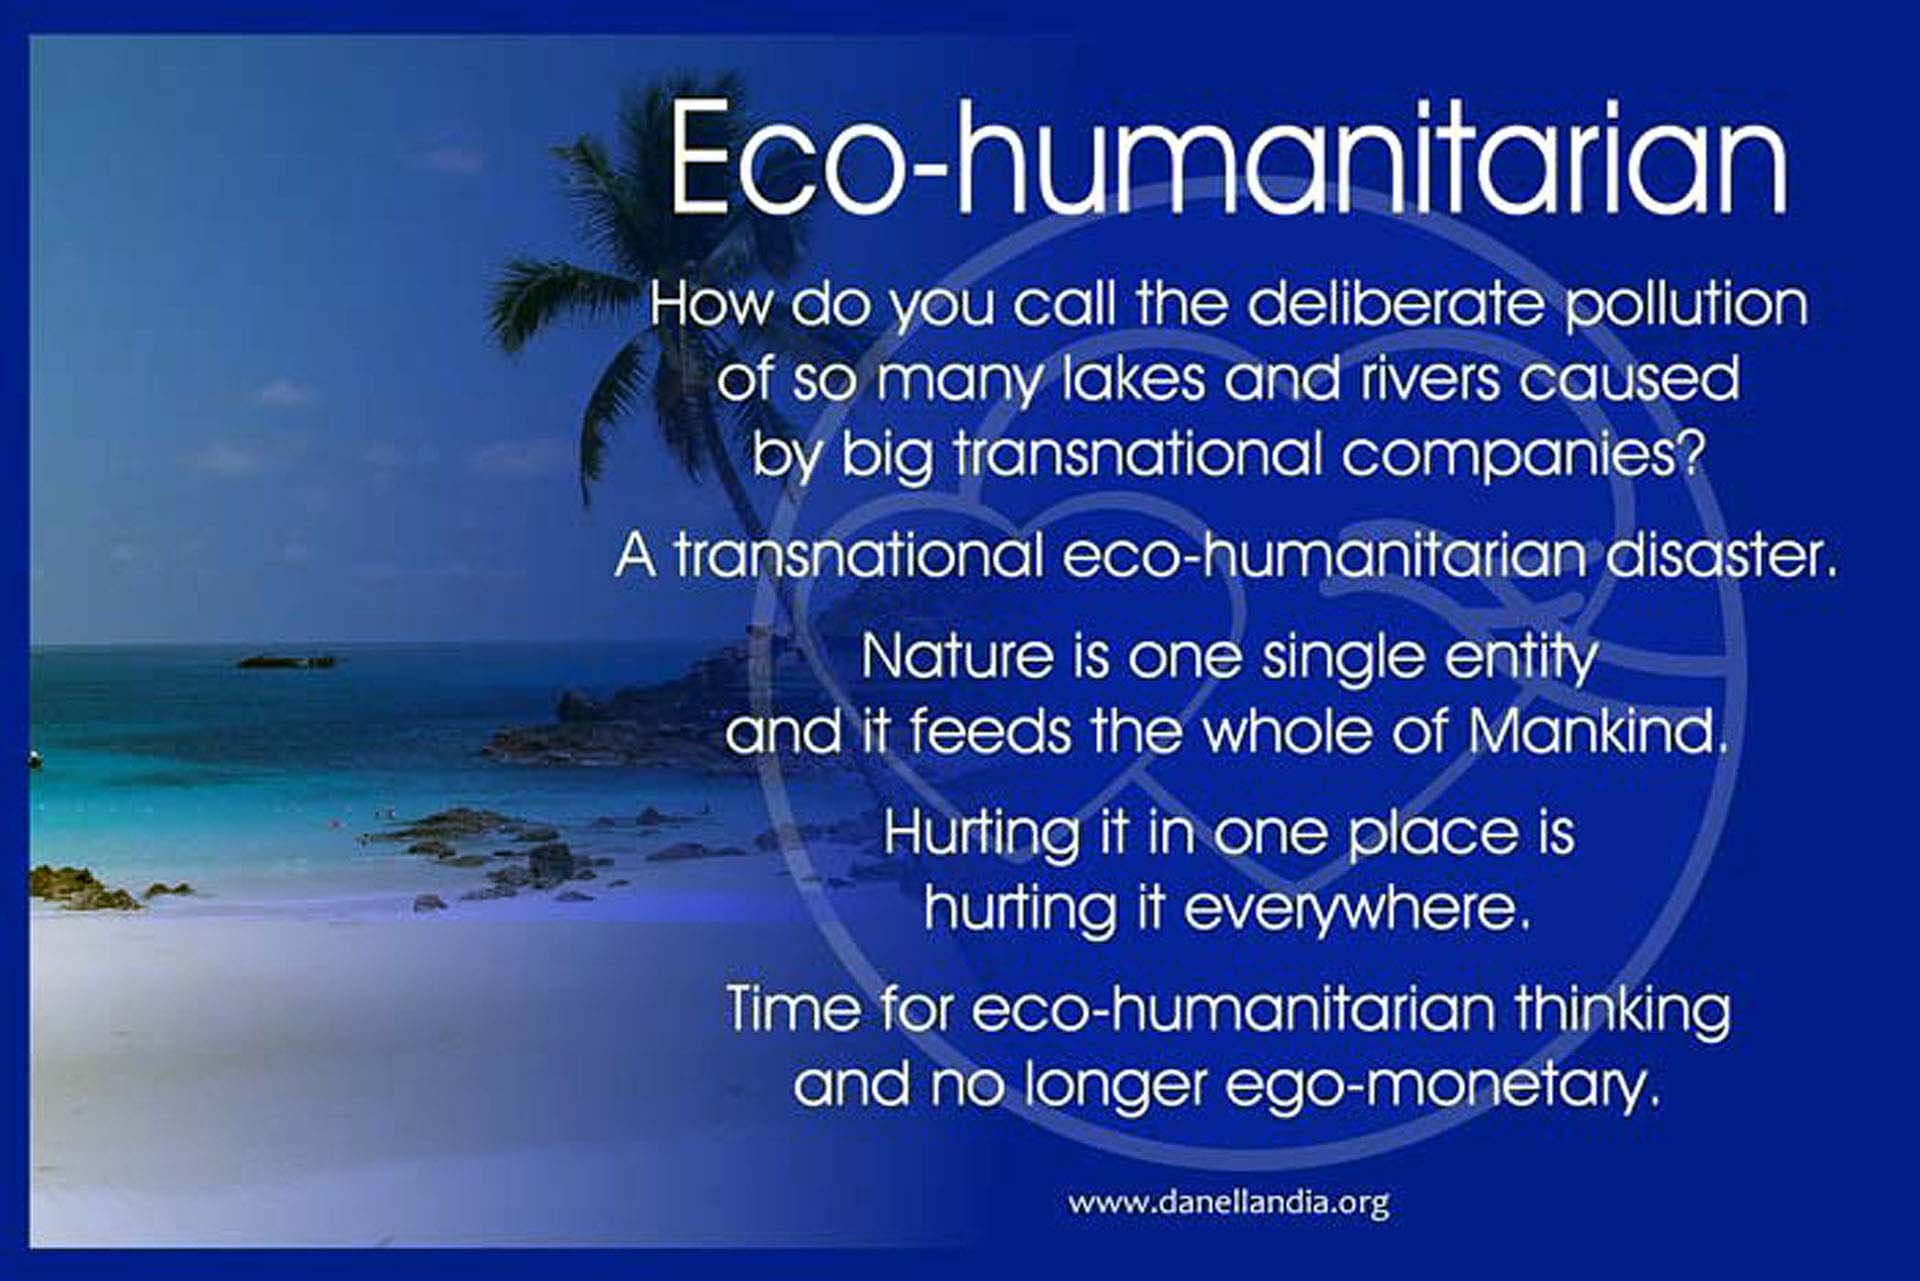 Eco-humanitarian